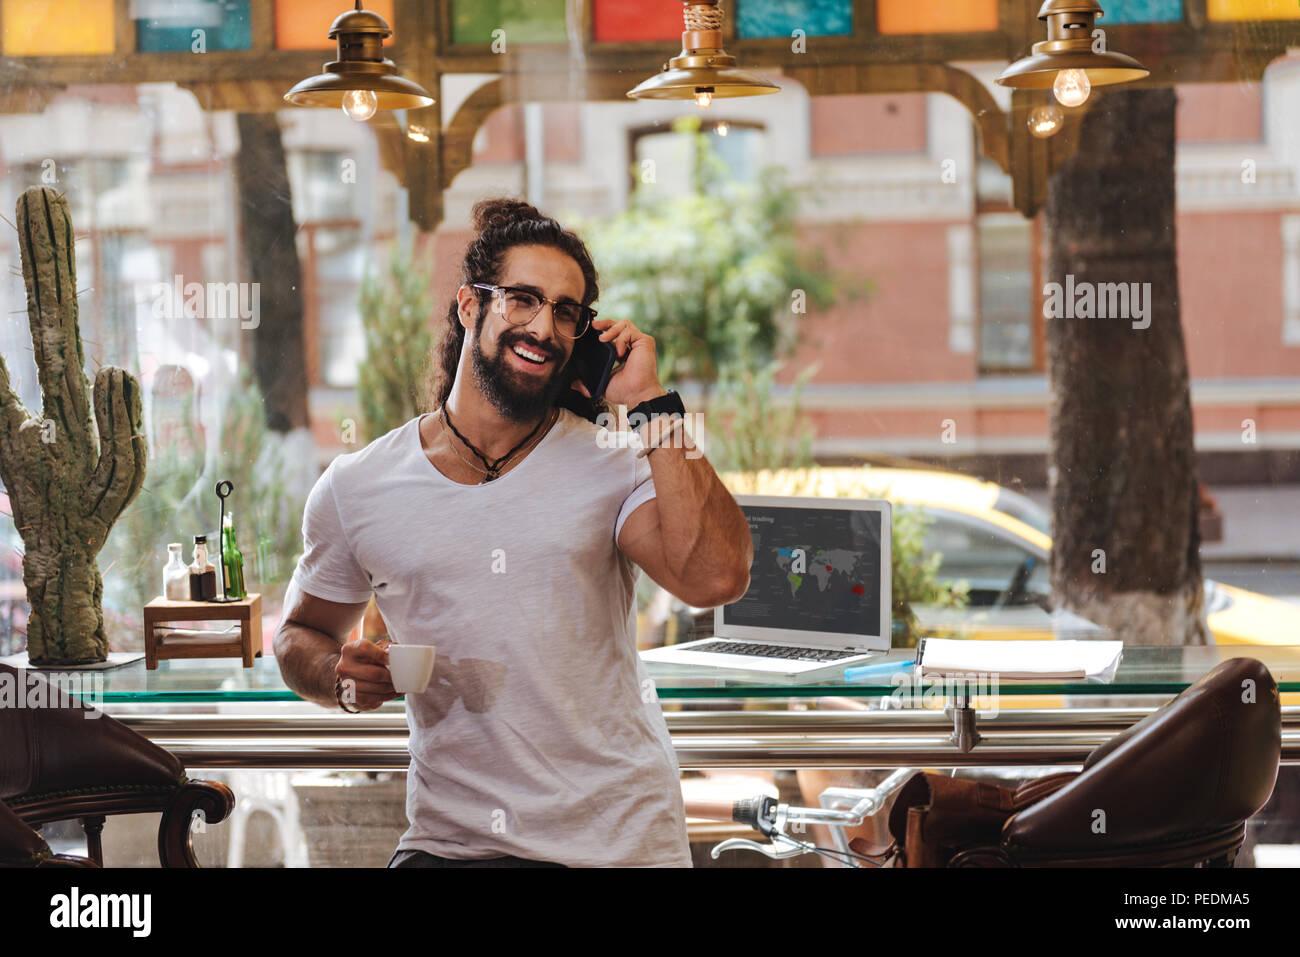 Joyful happy man having espresso - Stock Image